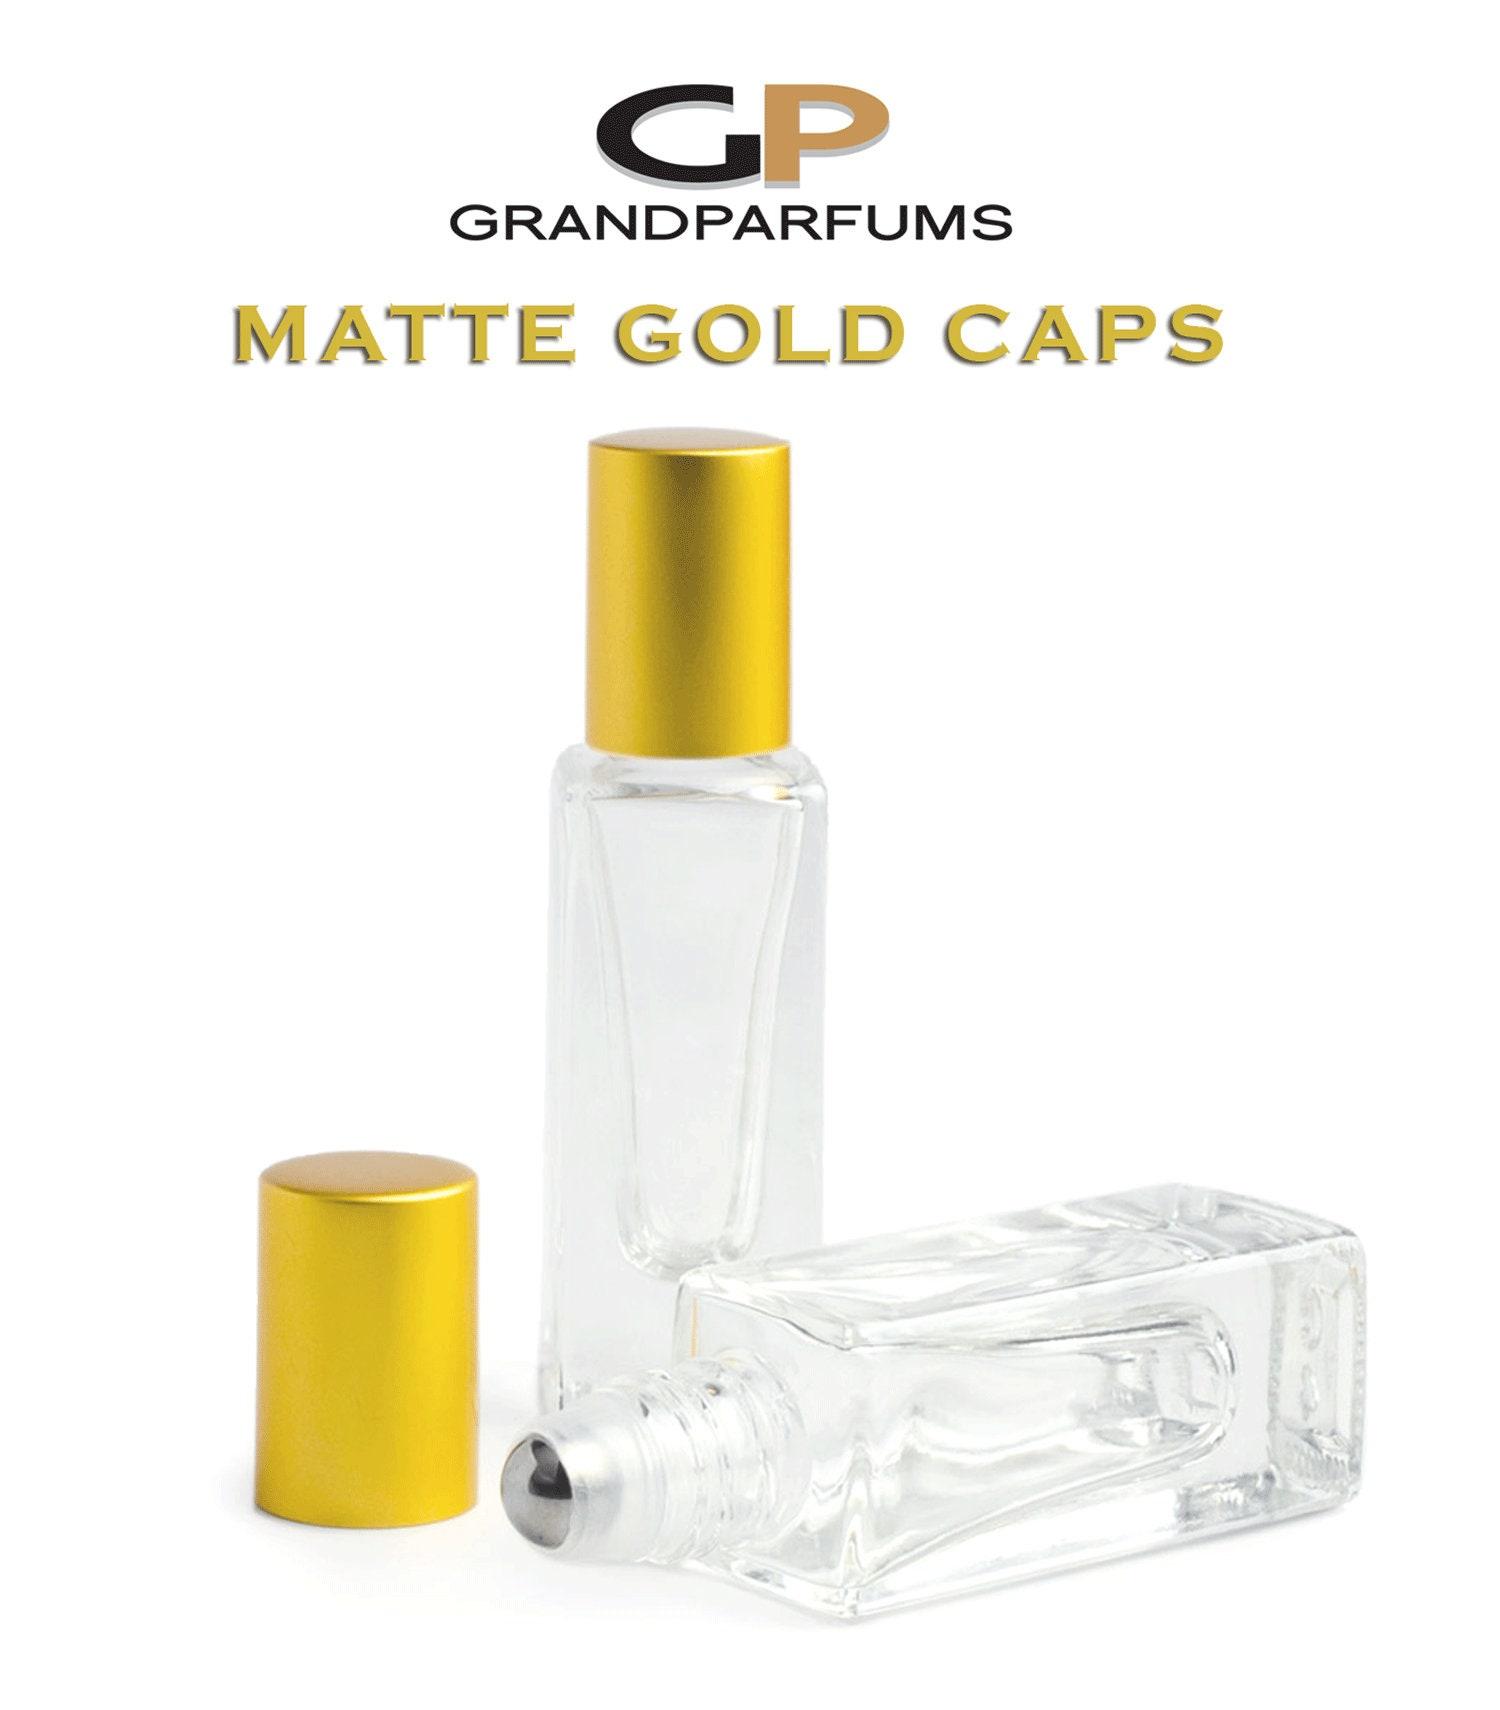 ce34f93cbb56 12Pcs 5ml Roller Bottles, MATTE Gold/Silver Caps LUXuRY SQUARE Clear ...